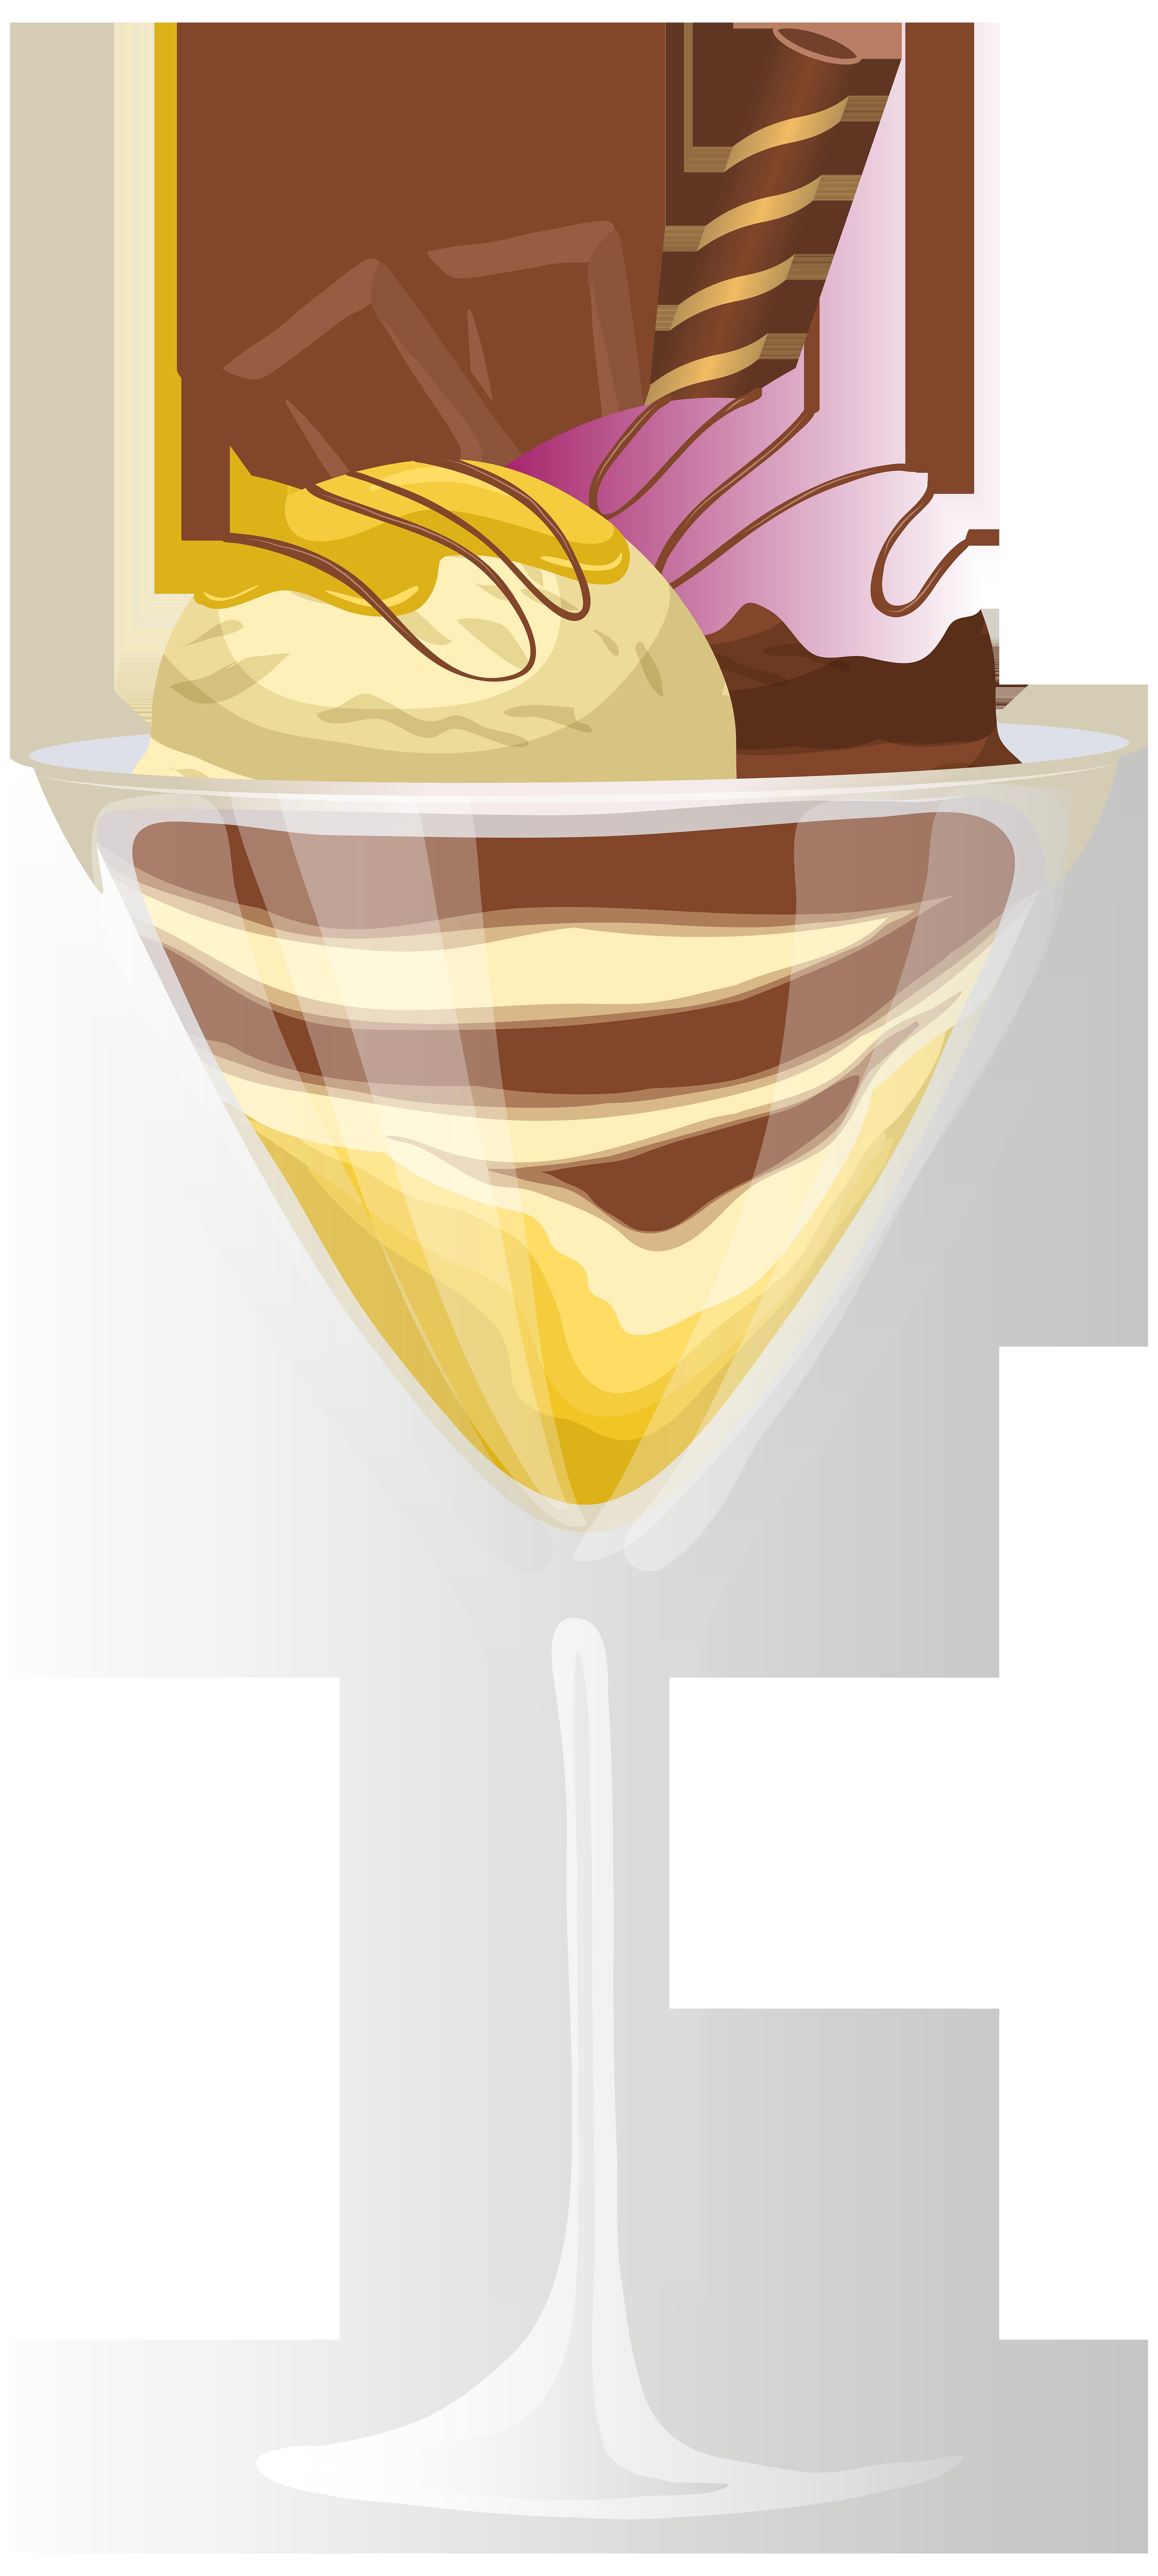 Sun cream clipart jpg freeuse download Ice Cream Sundae PNG Clip Art - Best WEB Clipart jpg freeuse download